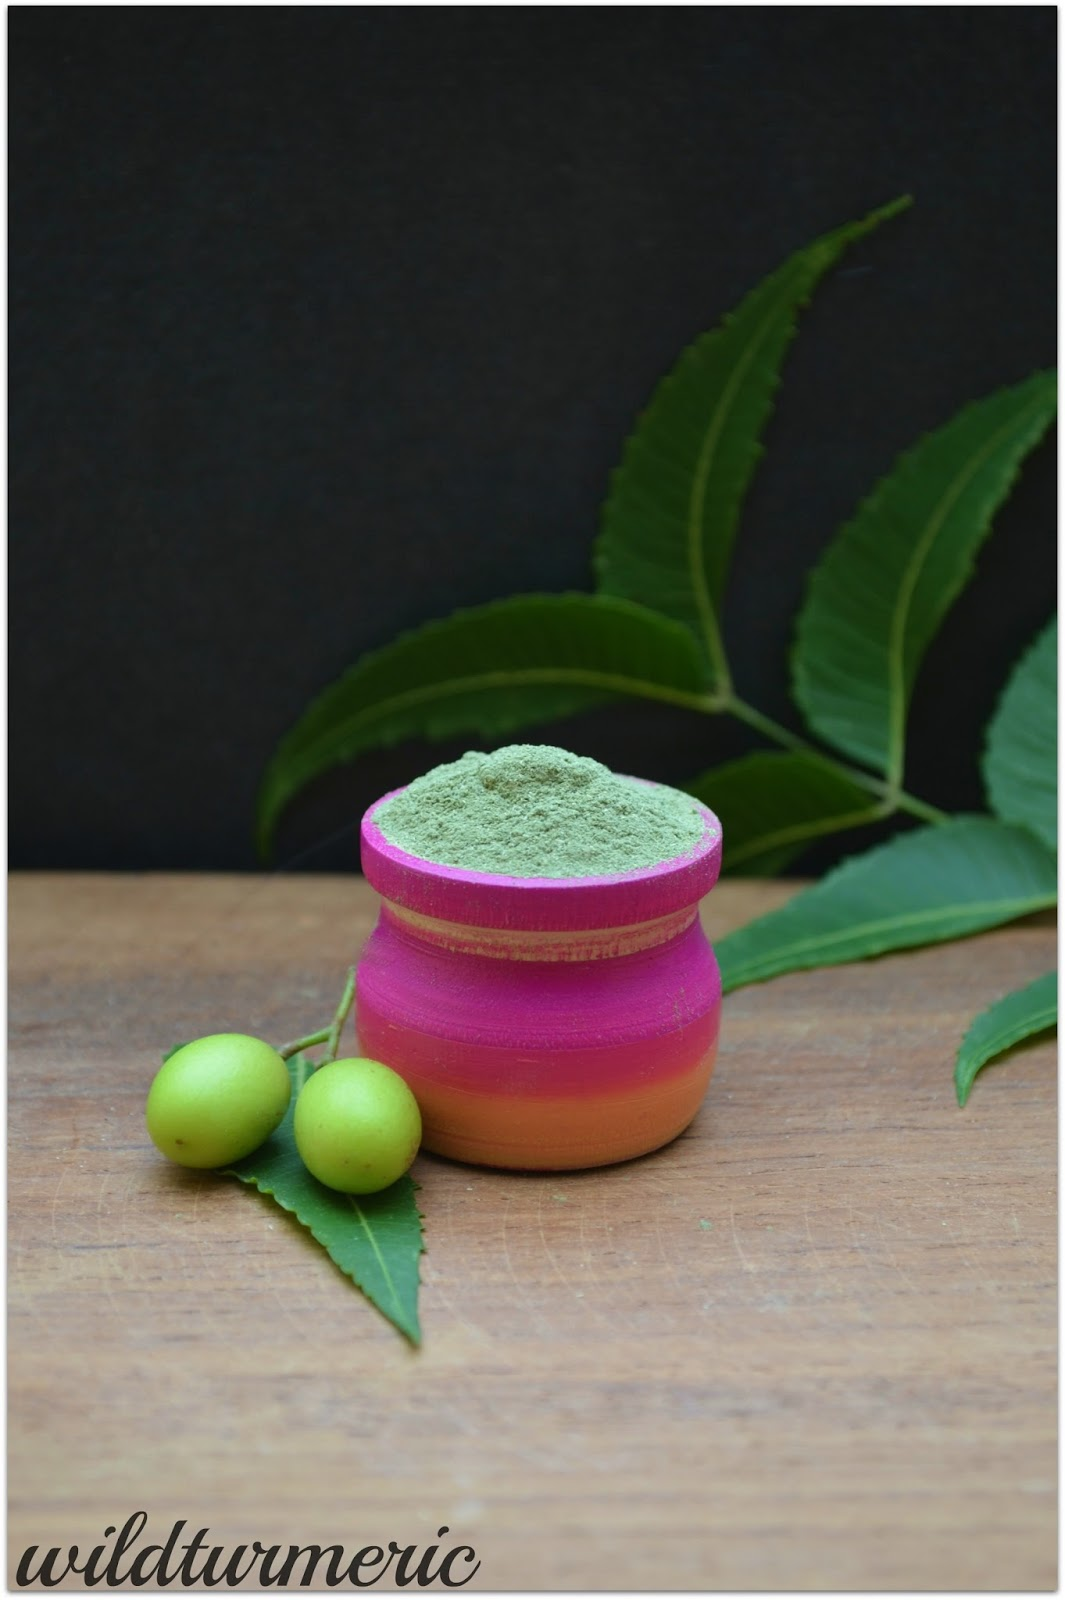 10 Top Skin, Hair & Health Benefits & Uses Of Neem Powder